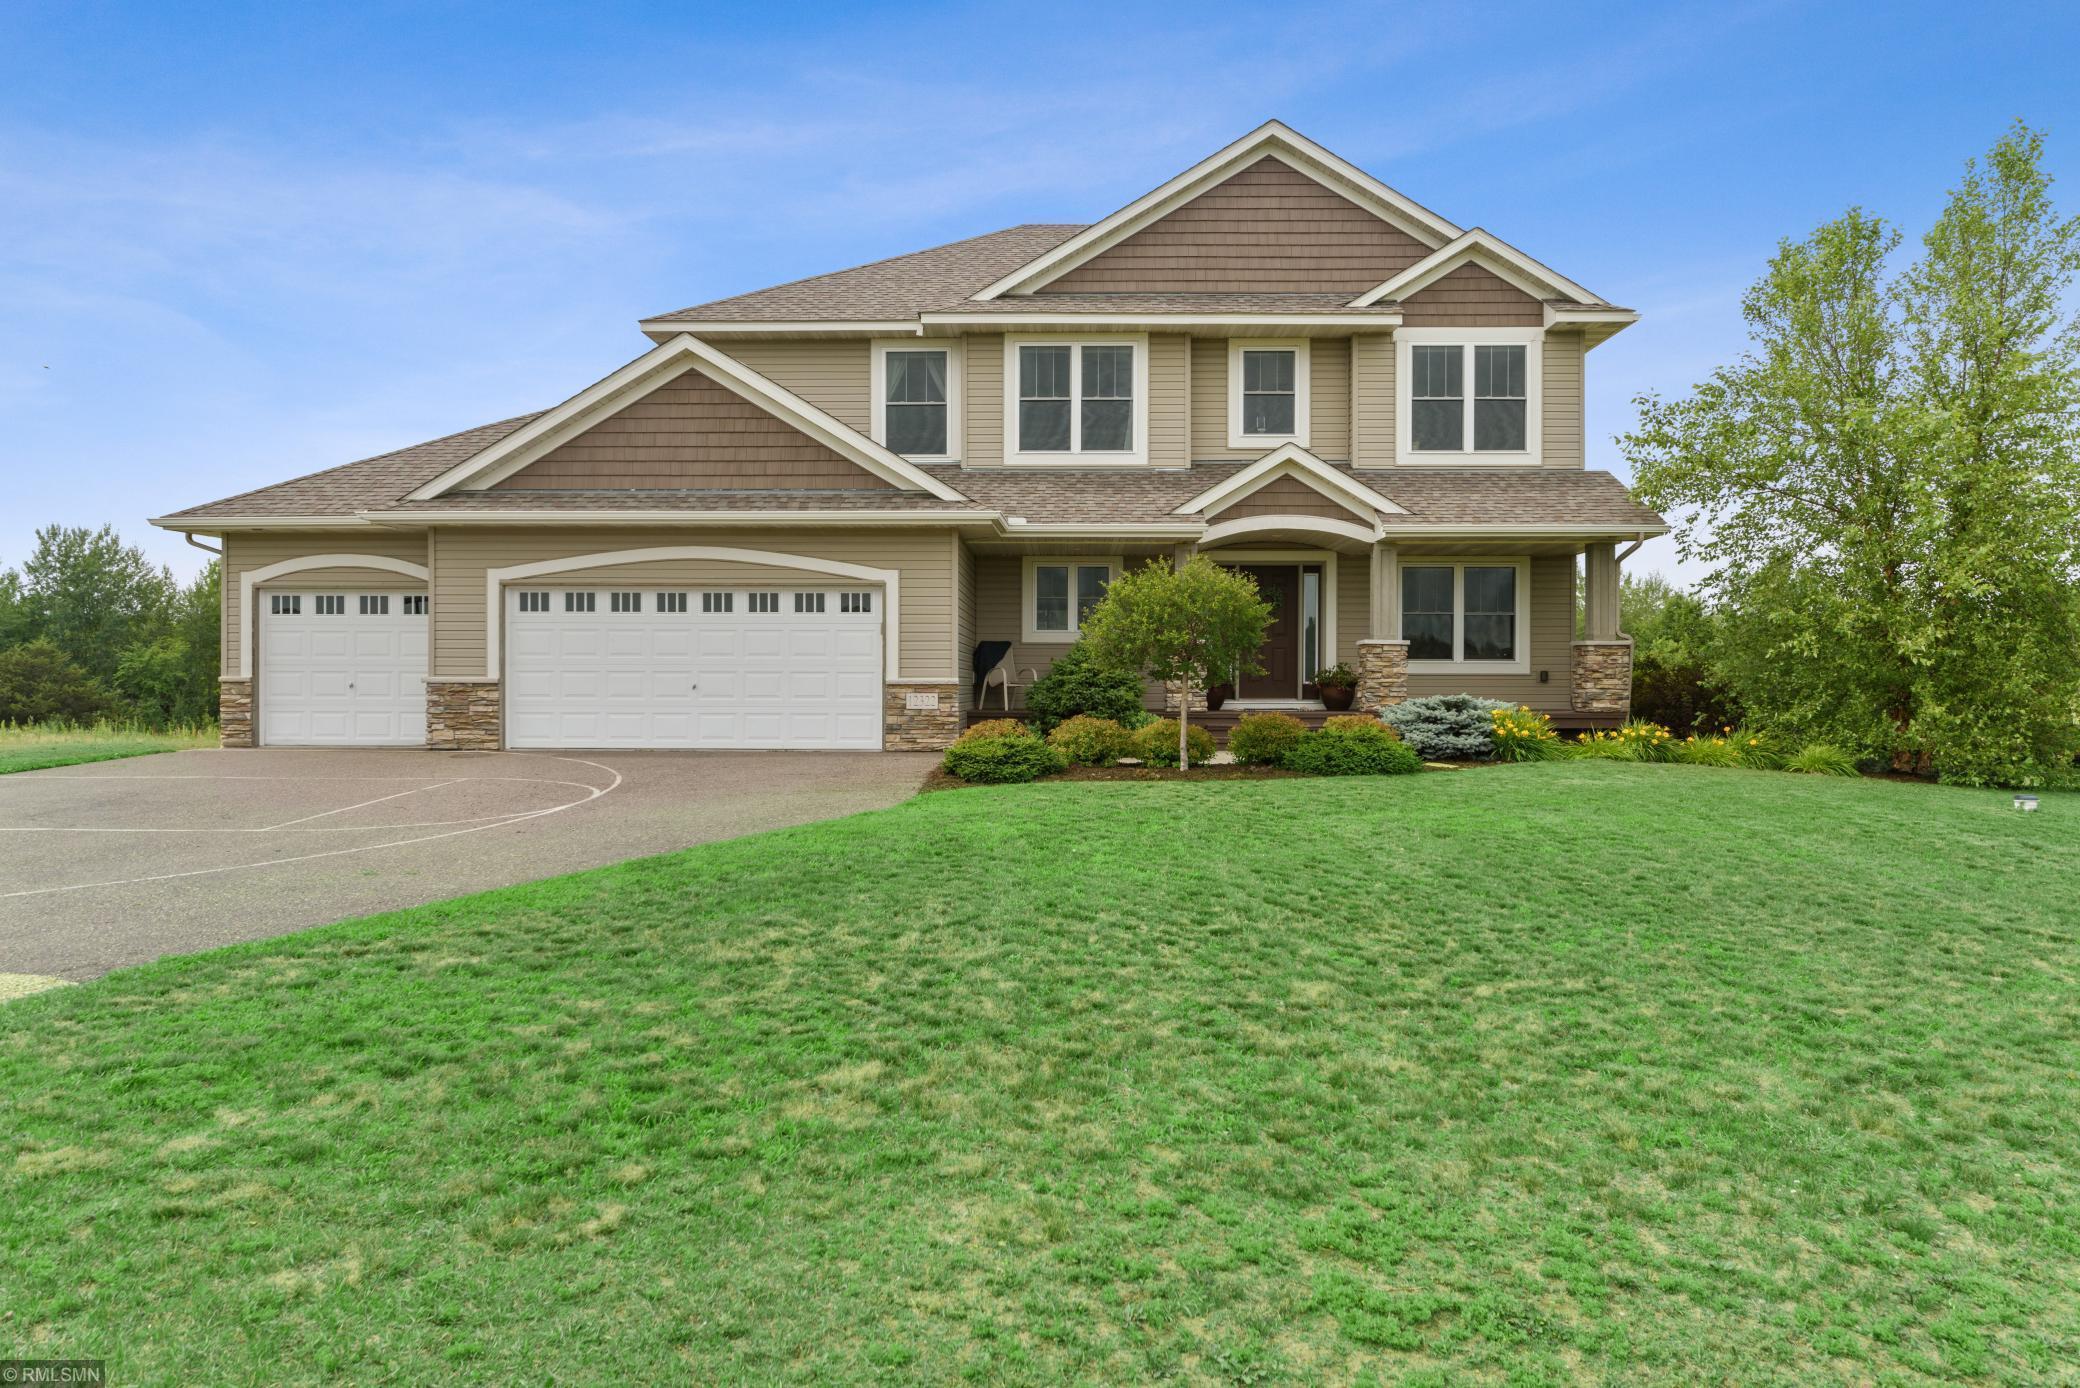 12322 173rd SE Property Photo - Becker, MN real estate listing